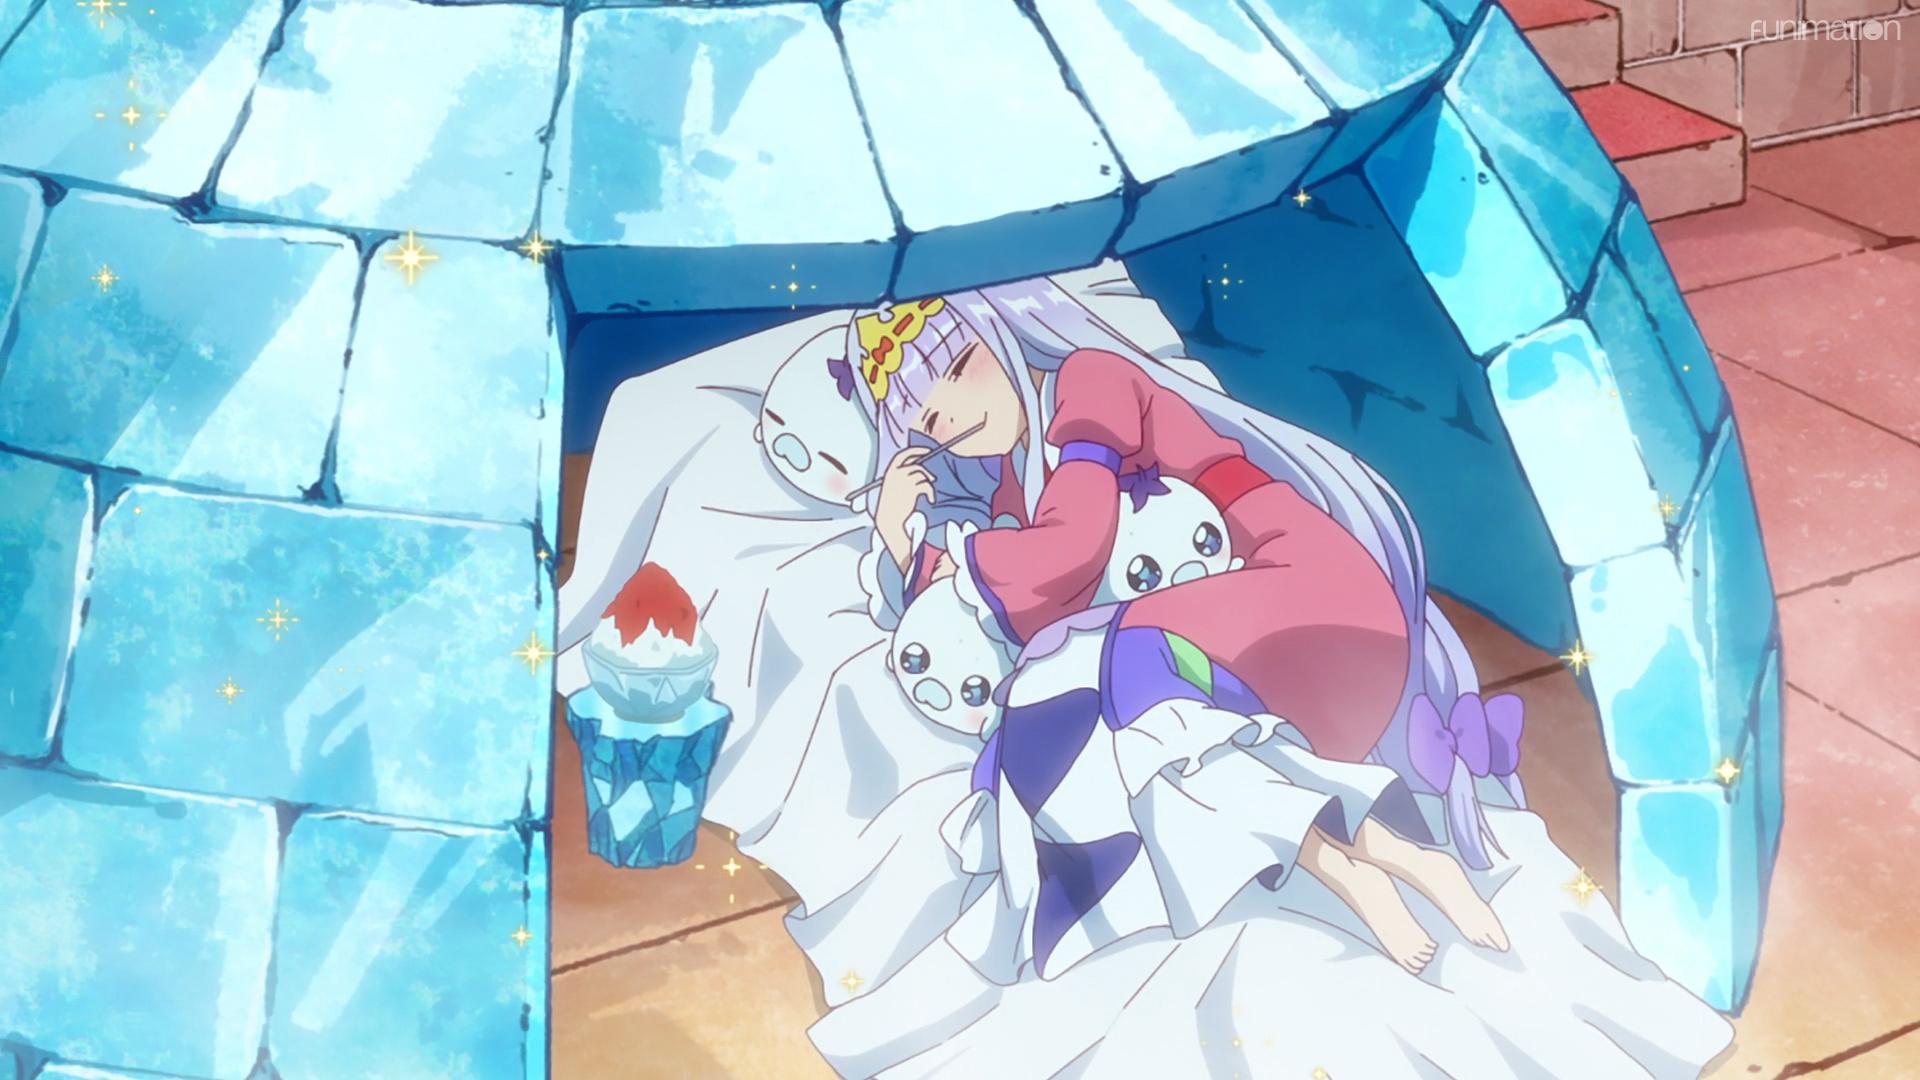 Sleepy Princess in the Demon Castle 4